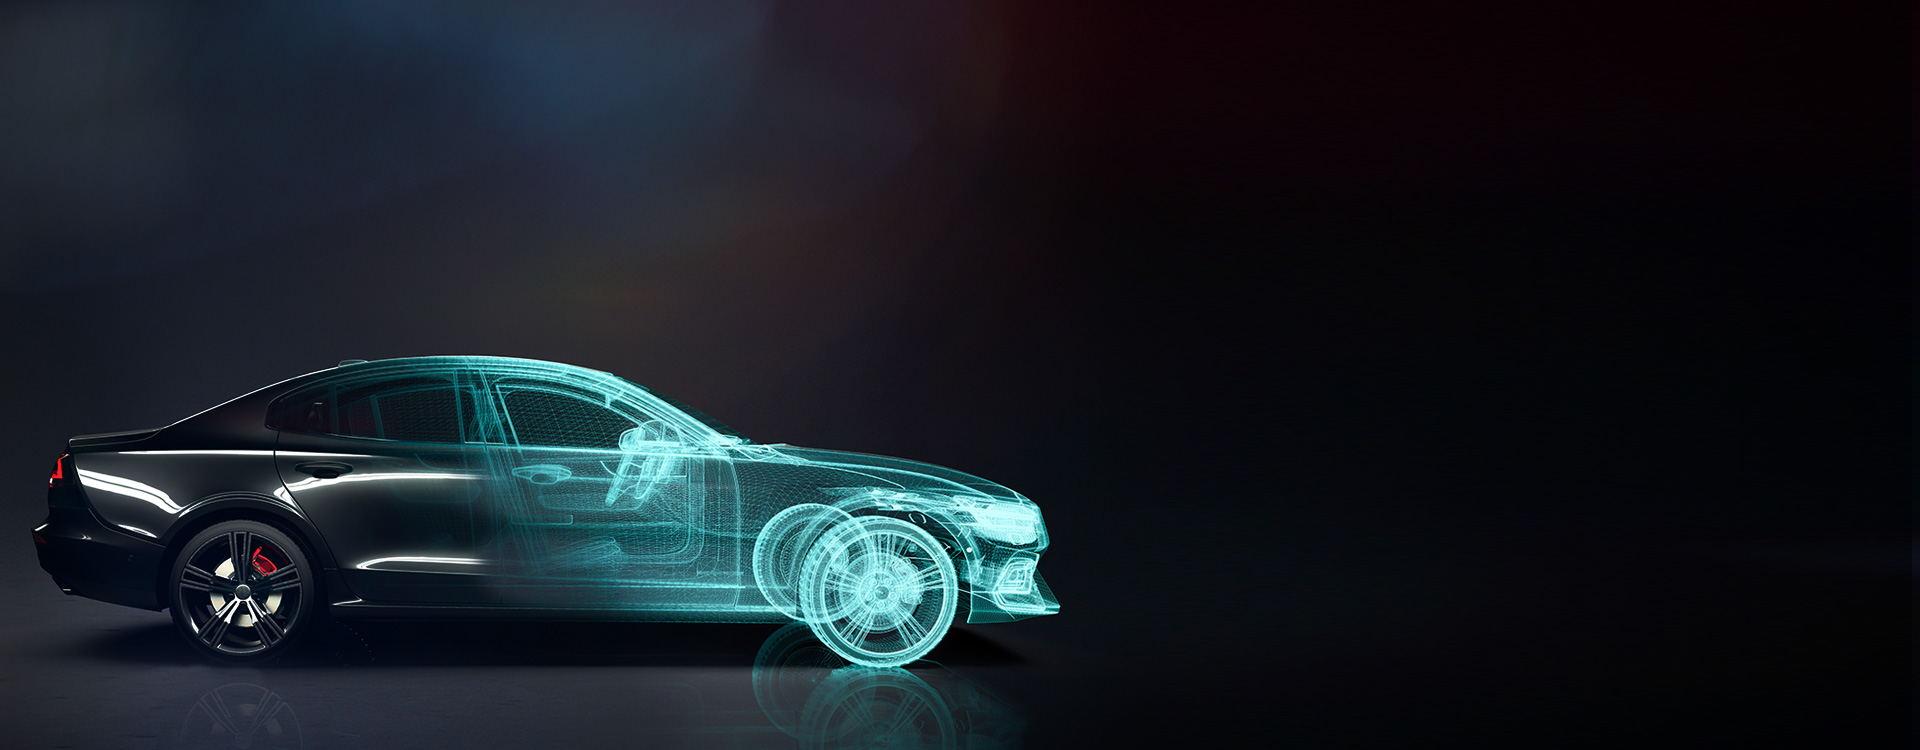 Powerful Hybrid Modeling